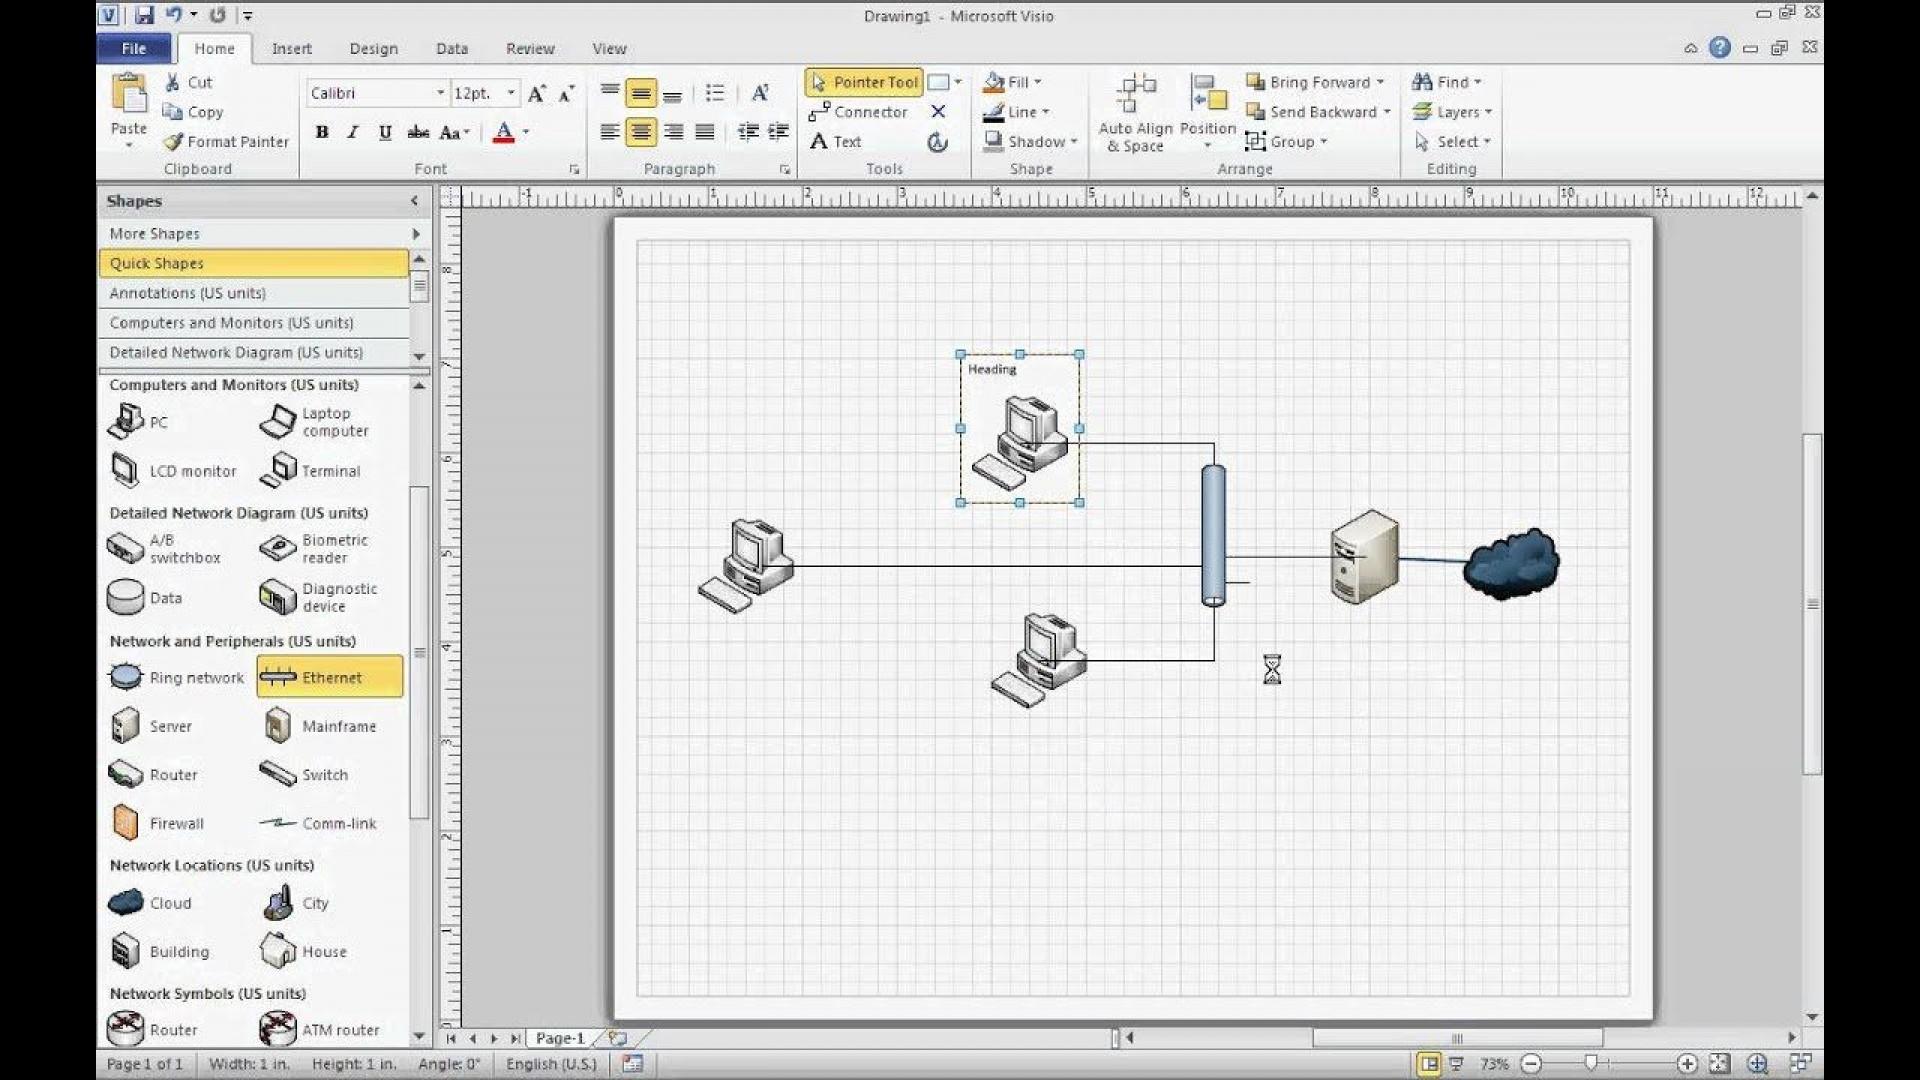 003 Impressive Use Case Diagram Microsoft Visio 2010 Highest Quality 1920